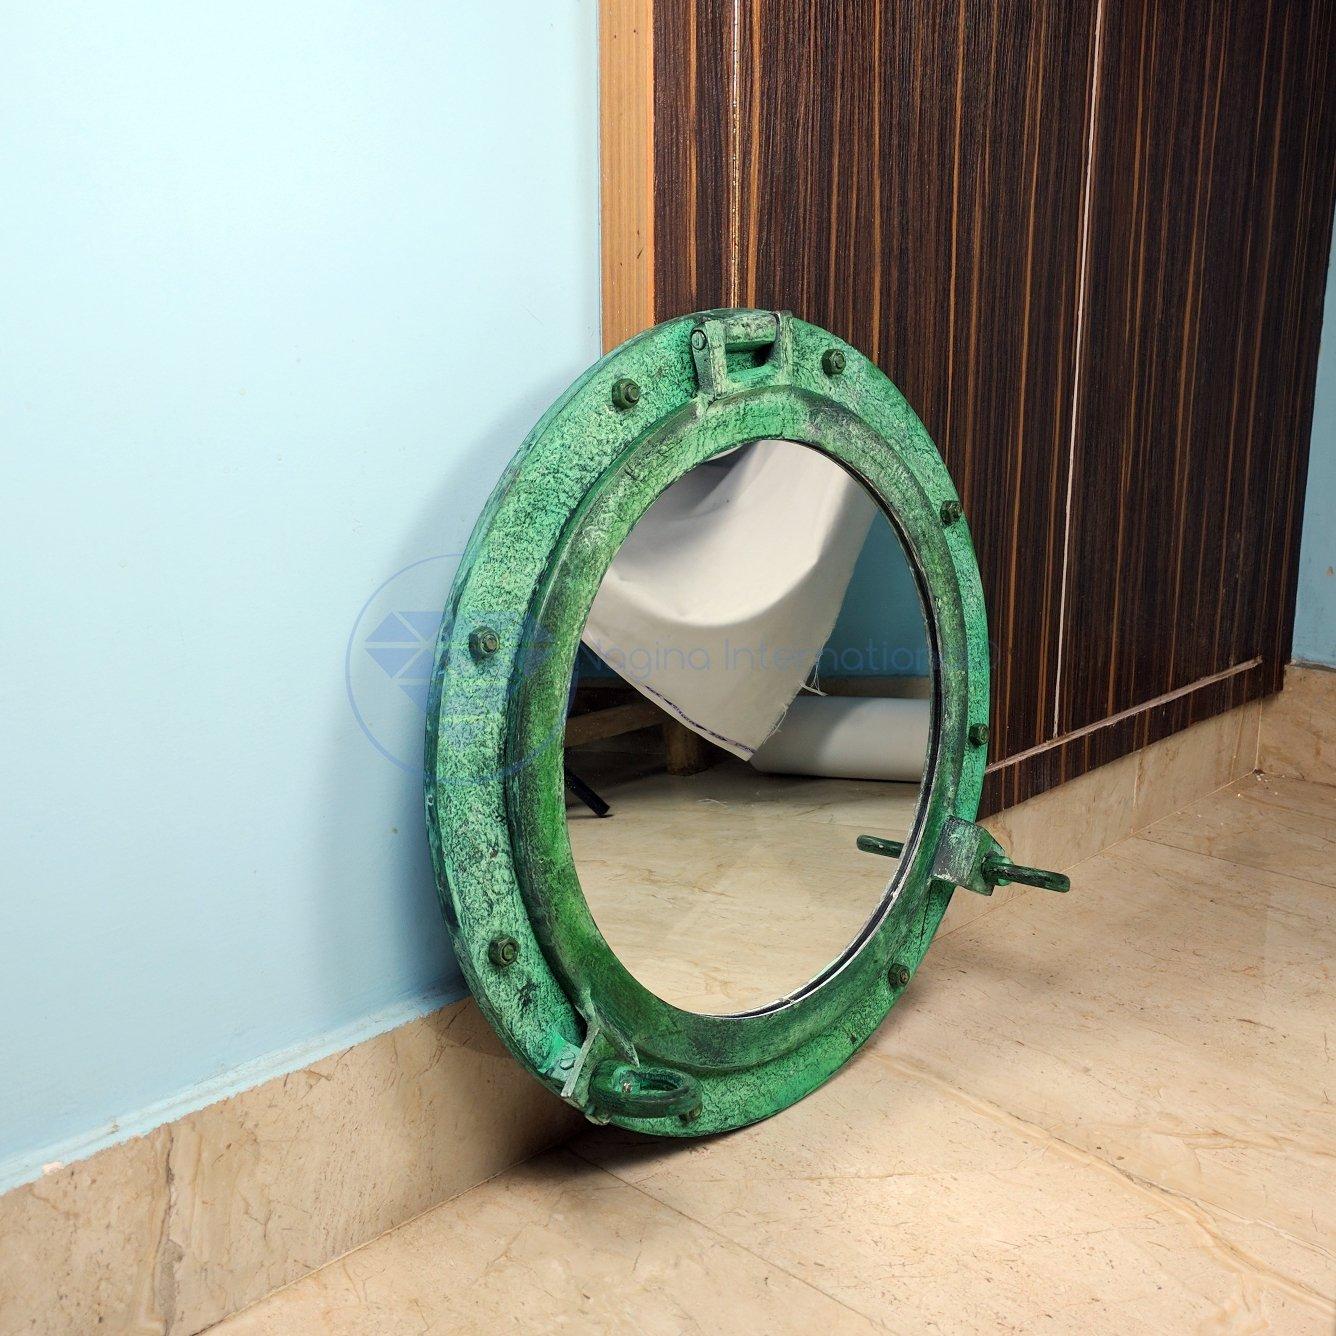 20'' Shipwrecked Premium Aluminum Antique Algae Green Porthole Mirror | Retirement Gift | Nagina International by Nagina International (Image #2)